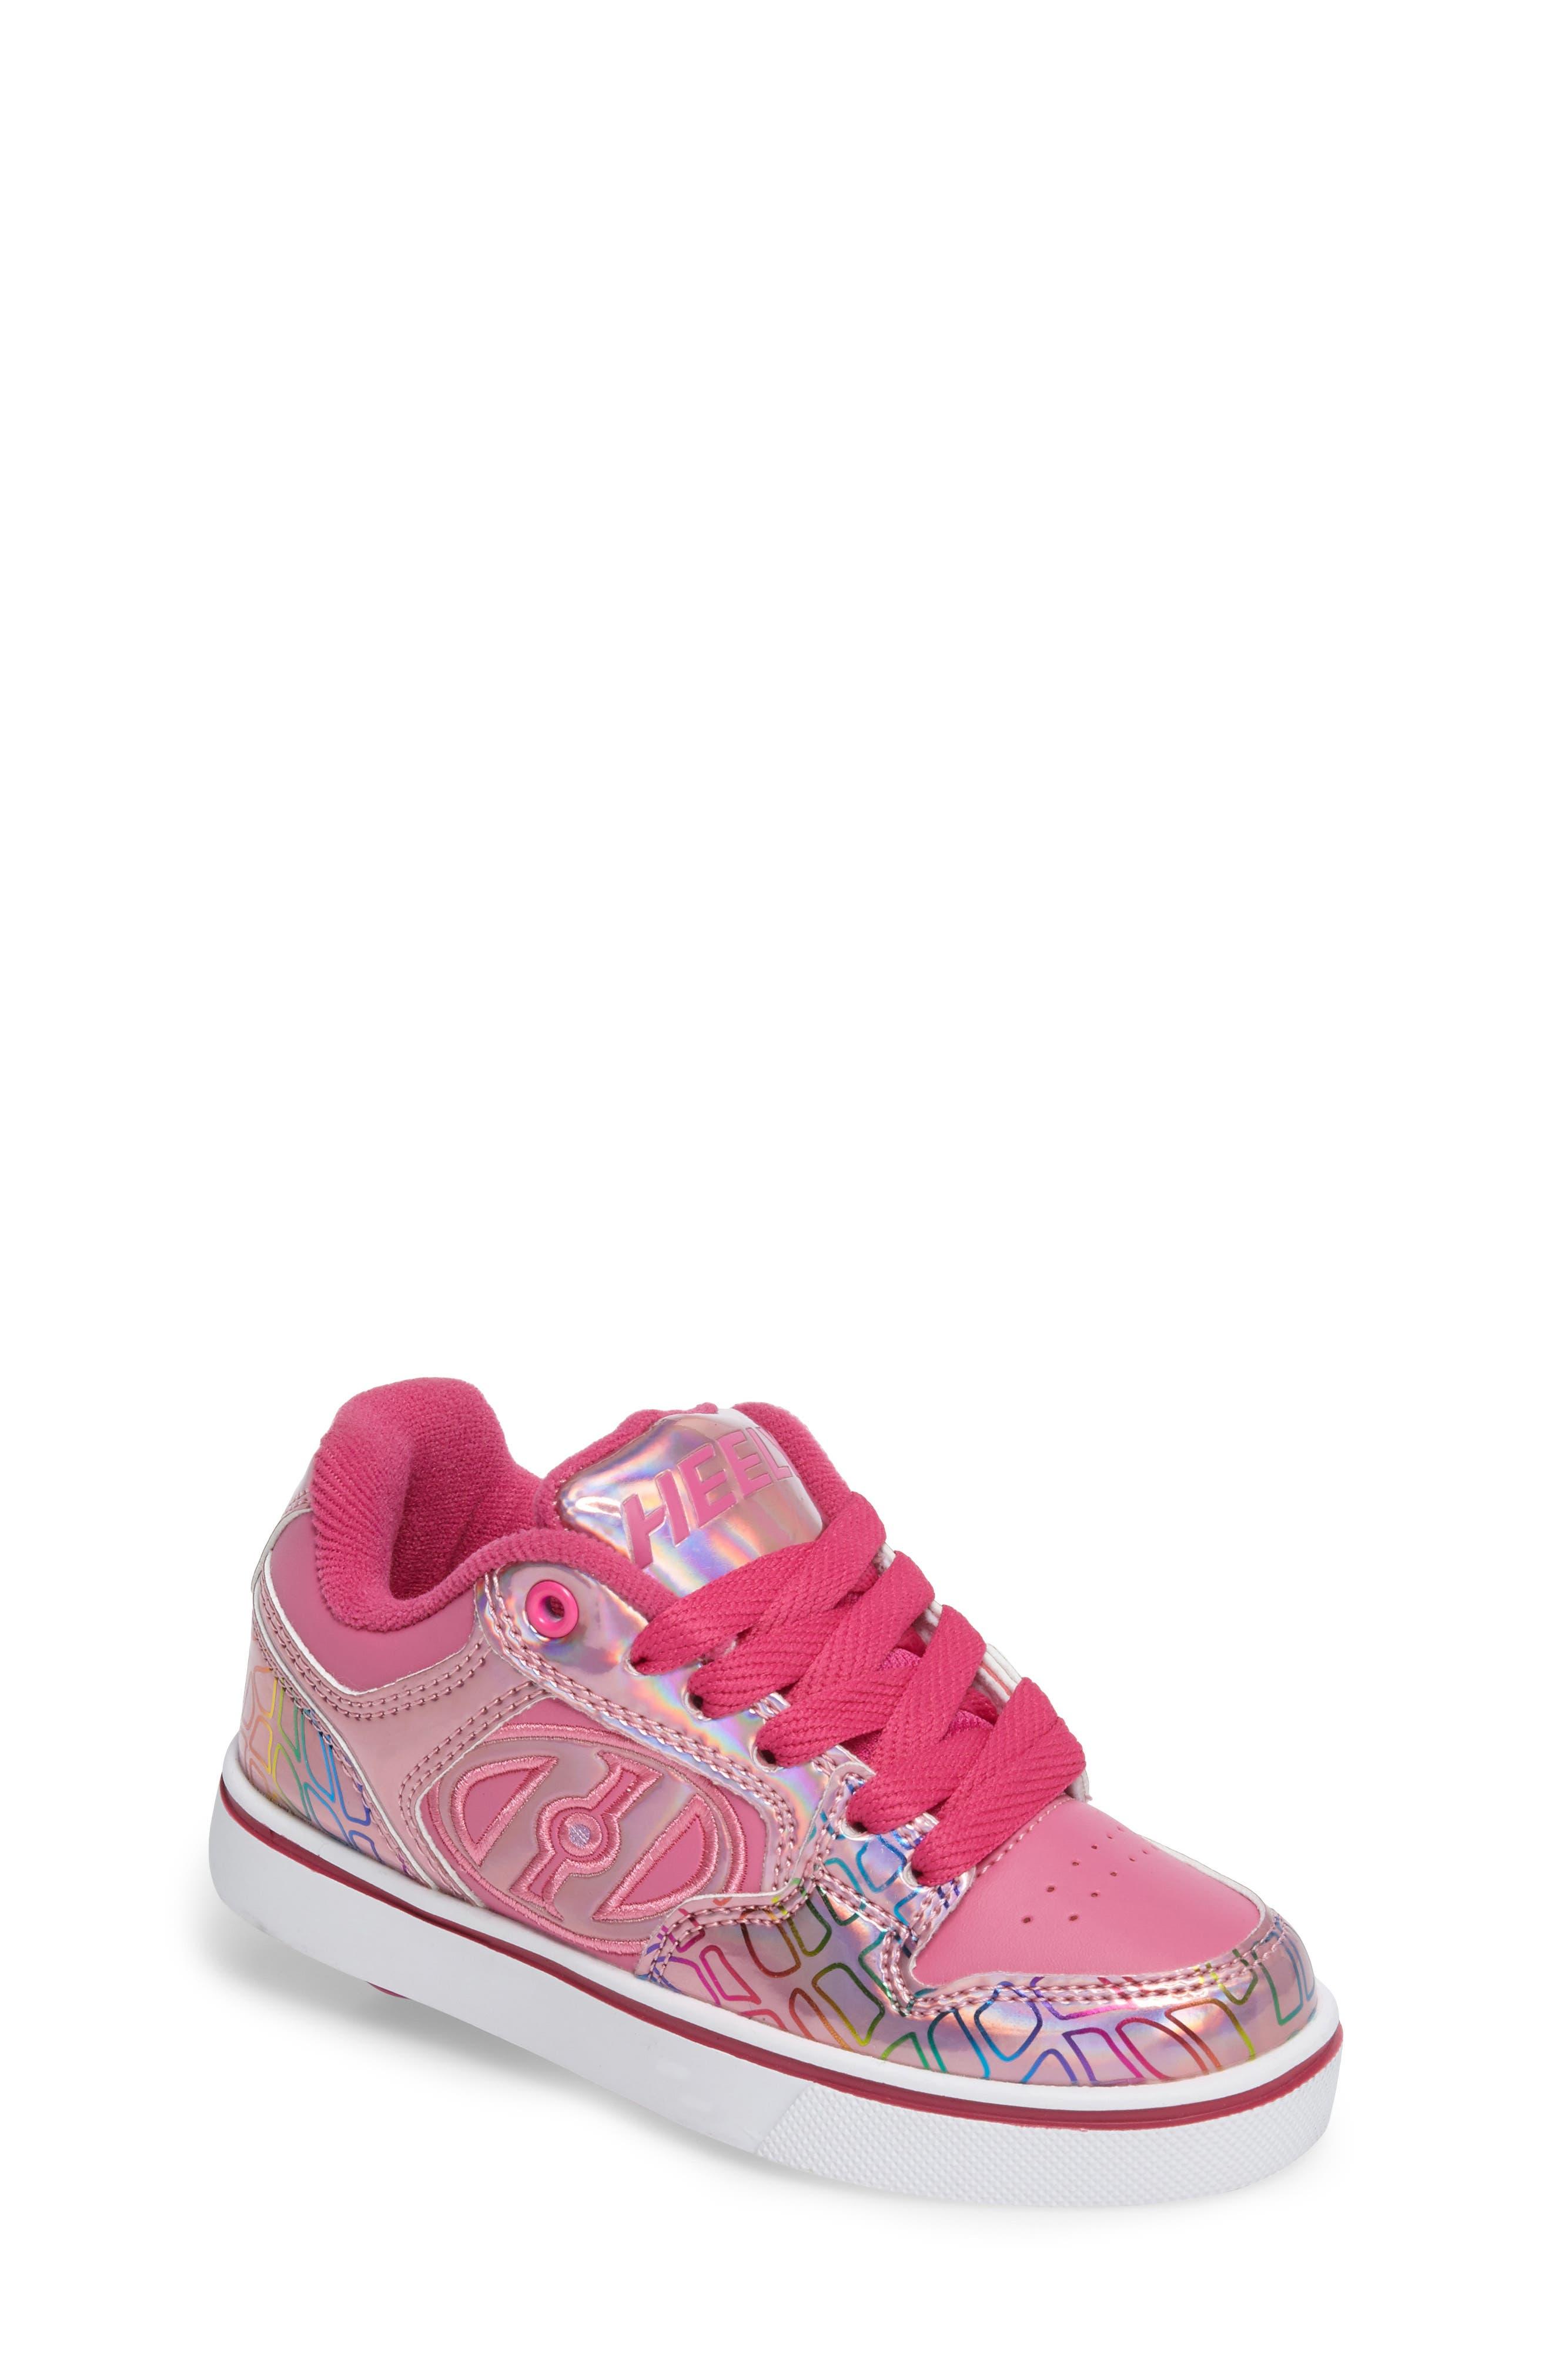 Motion Plus Skate Sneaker,                         Main,                         color, PINK/ LIGHT PINK